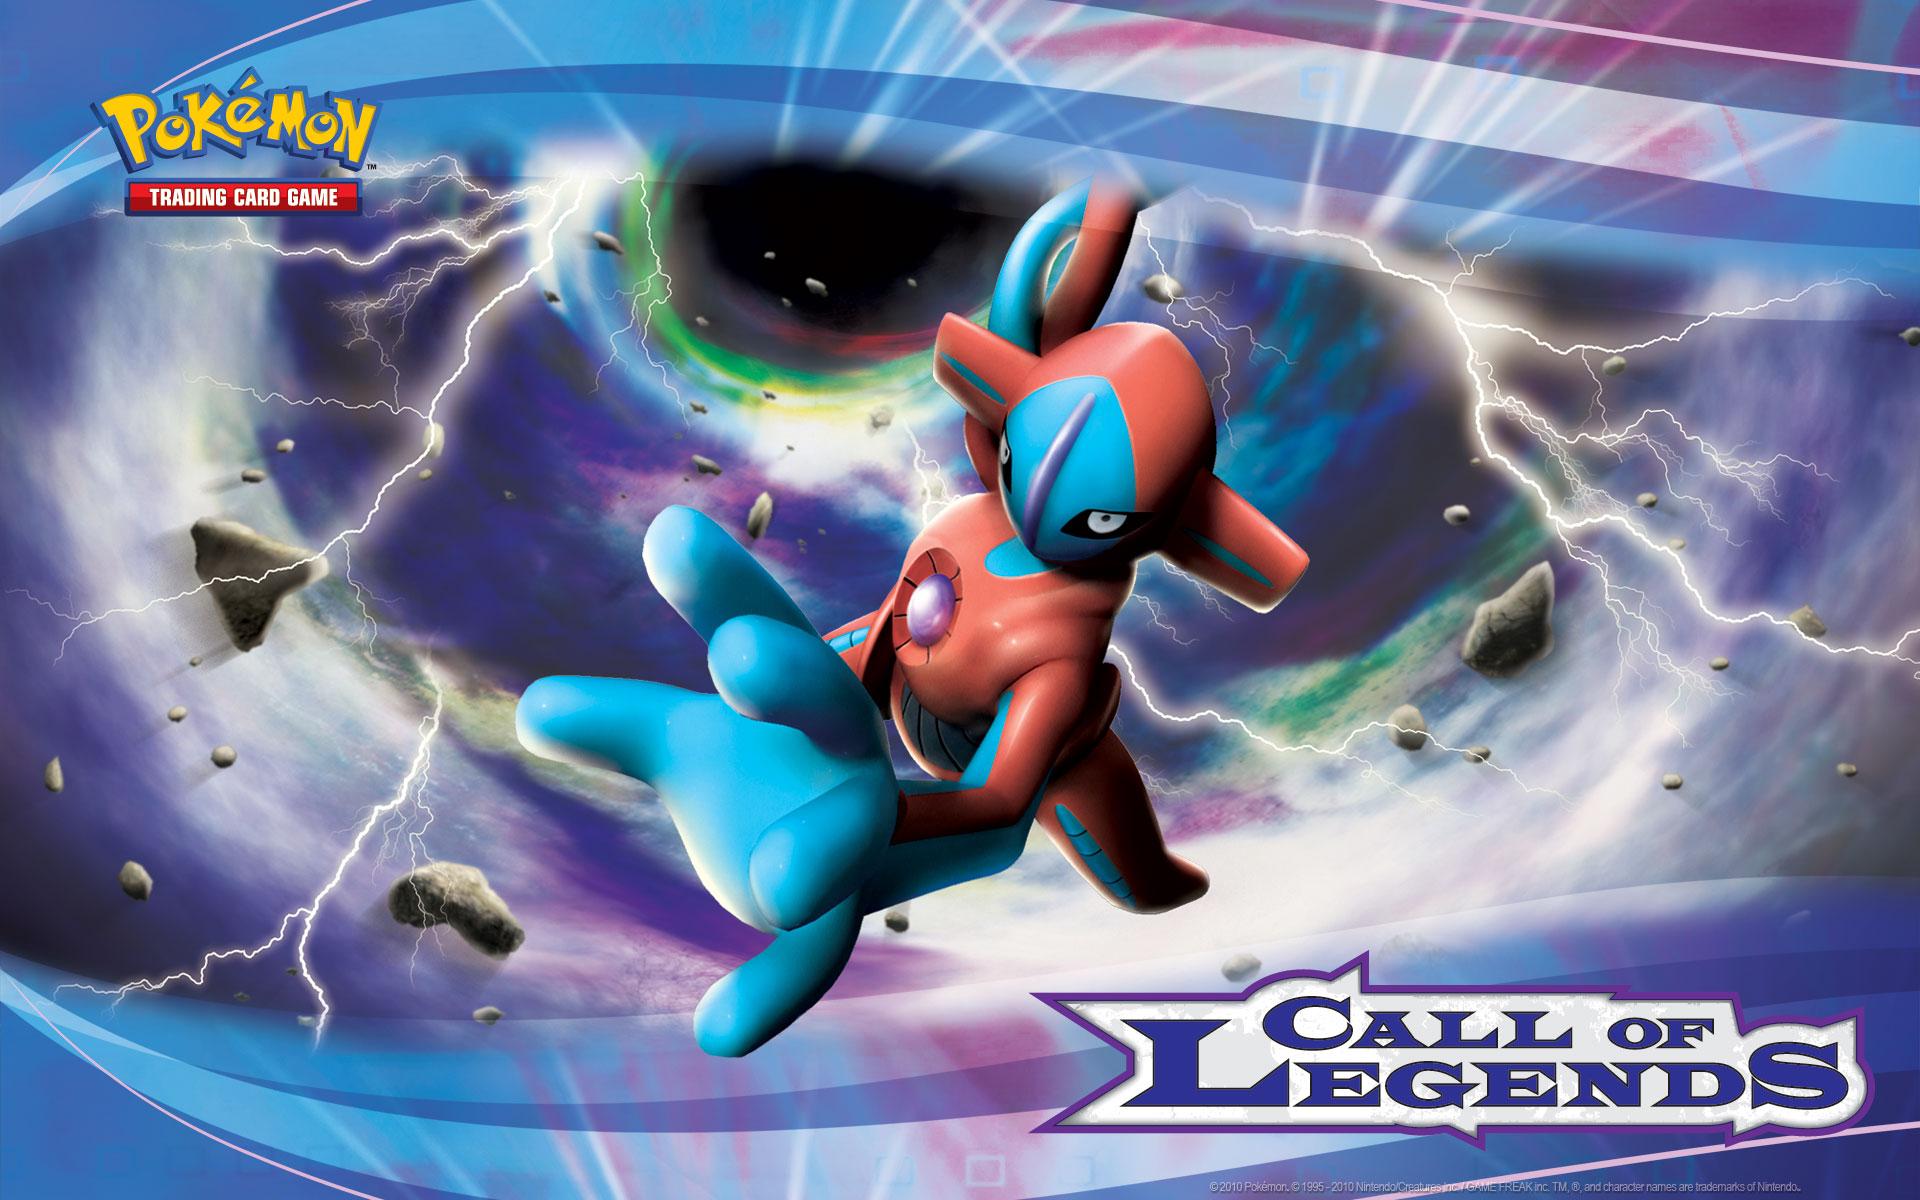 Pokémon HD Wallpaper | Hintergrund | 1920x1200 | ID:340316 - Wallpaper Abyss